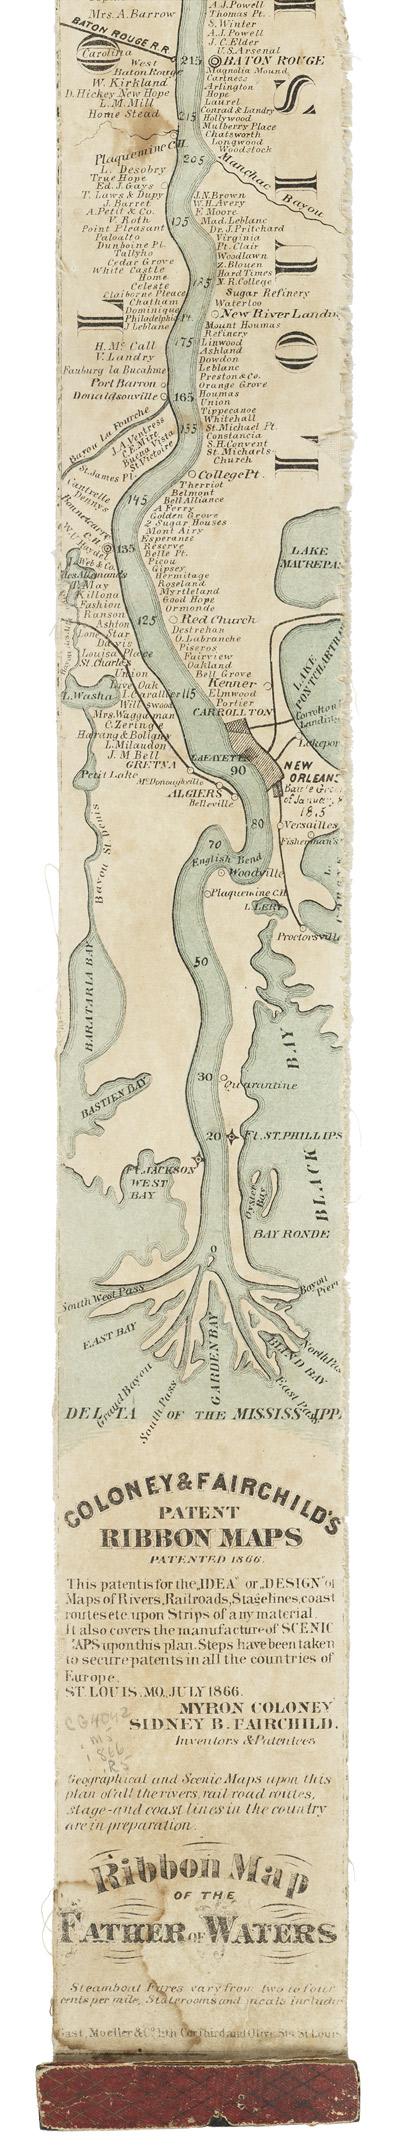 Maps As Art | Denver Public Library History